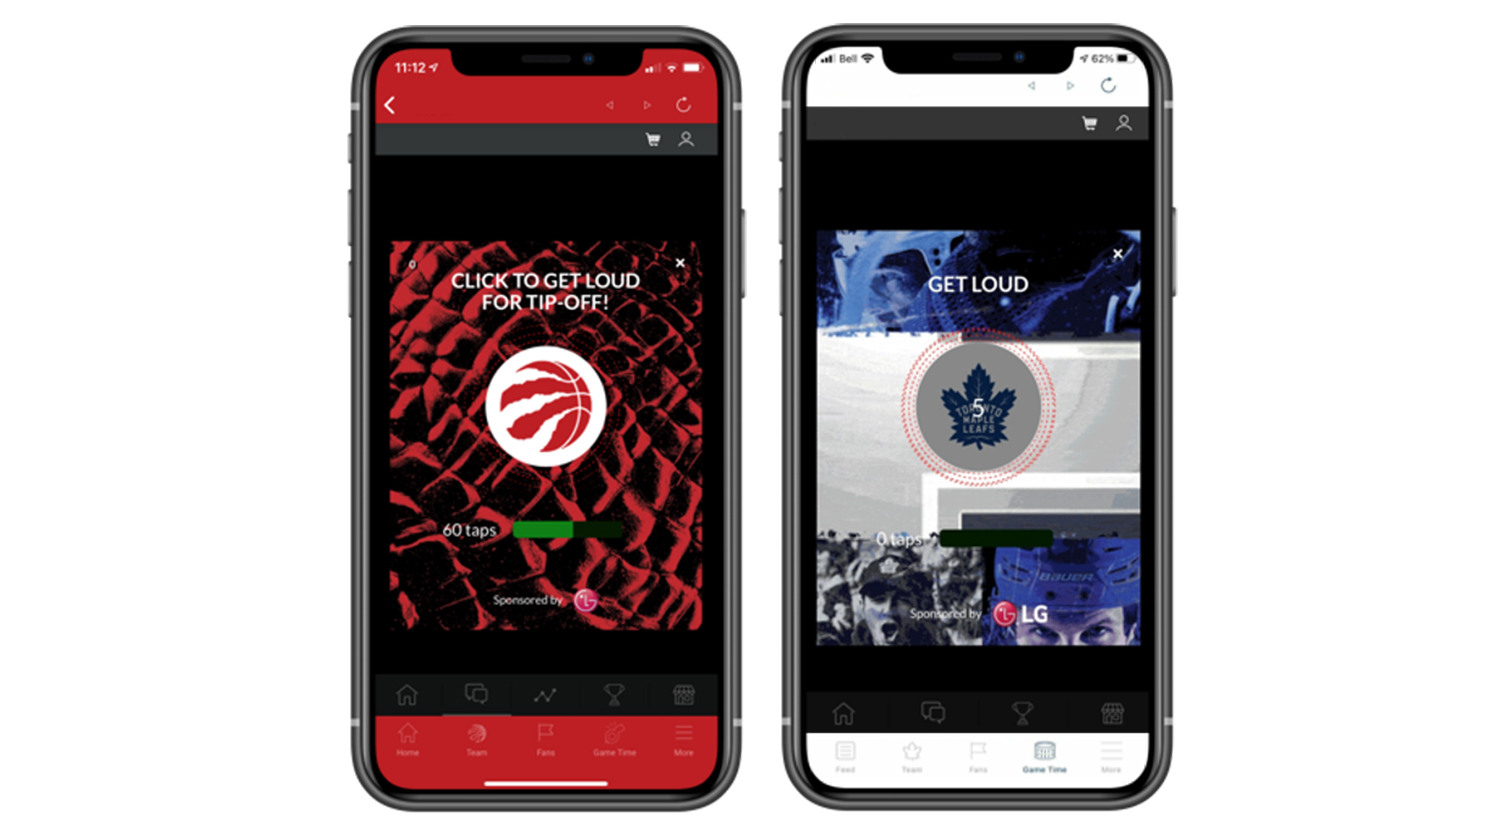 (LEFT) A view of the Toronto Raptors' mobile app. (RIGHT) A view of the Toronto Maple Leafs' mobile app.